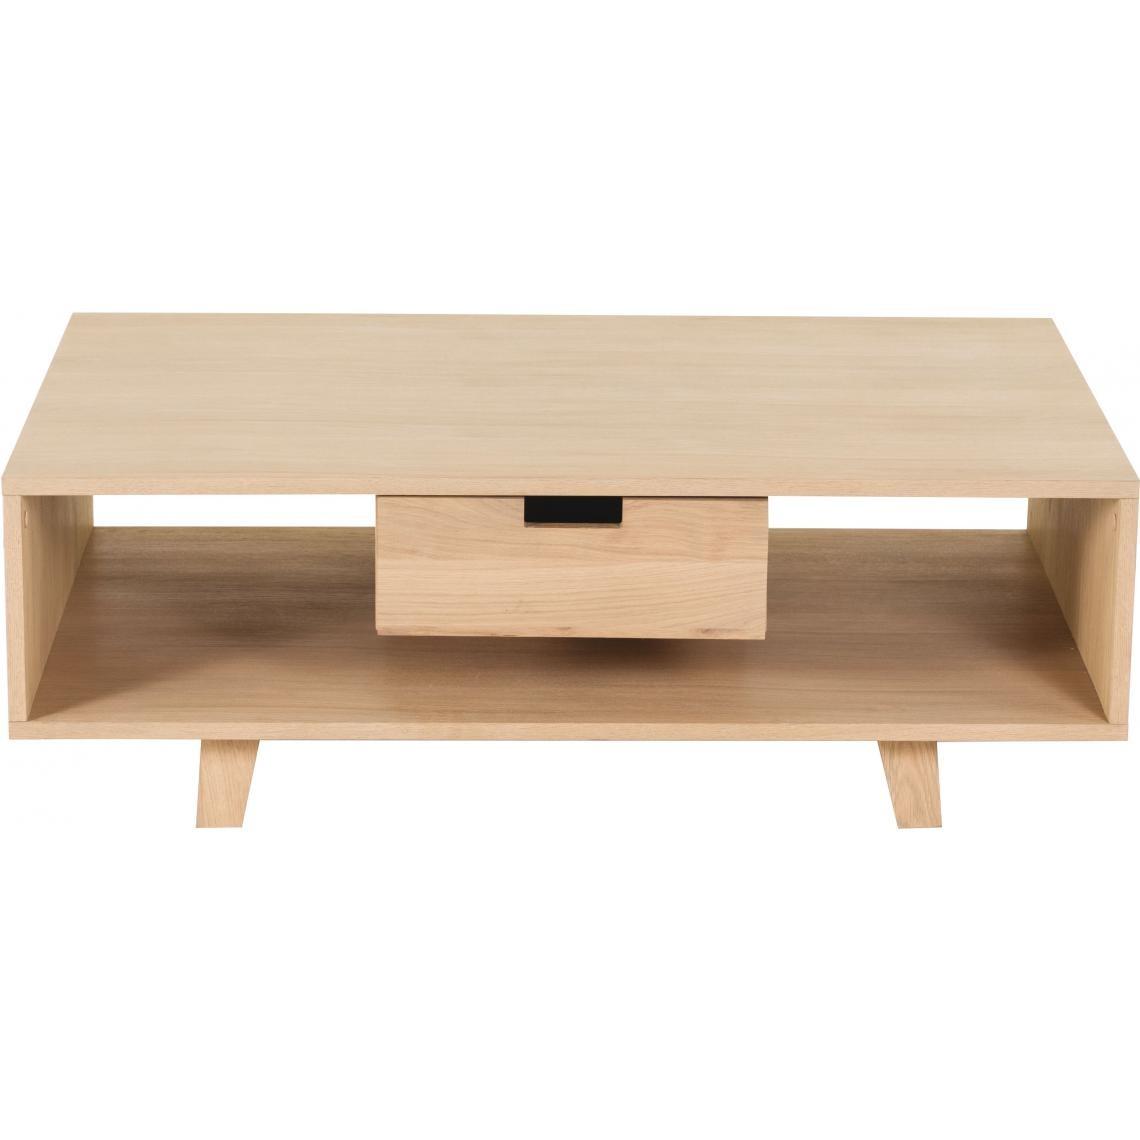 table basse scandinave avec 1 tiroir pietement en chene sergio